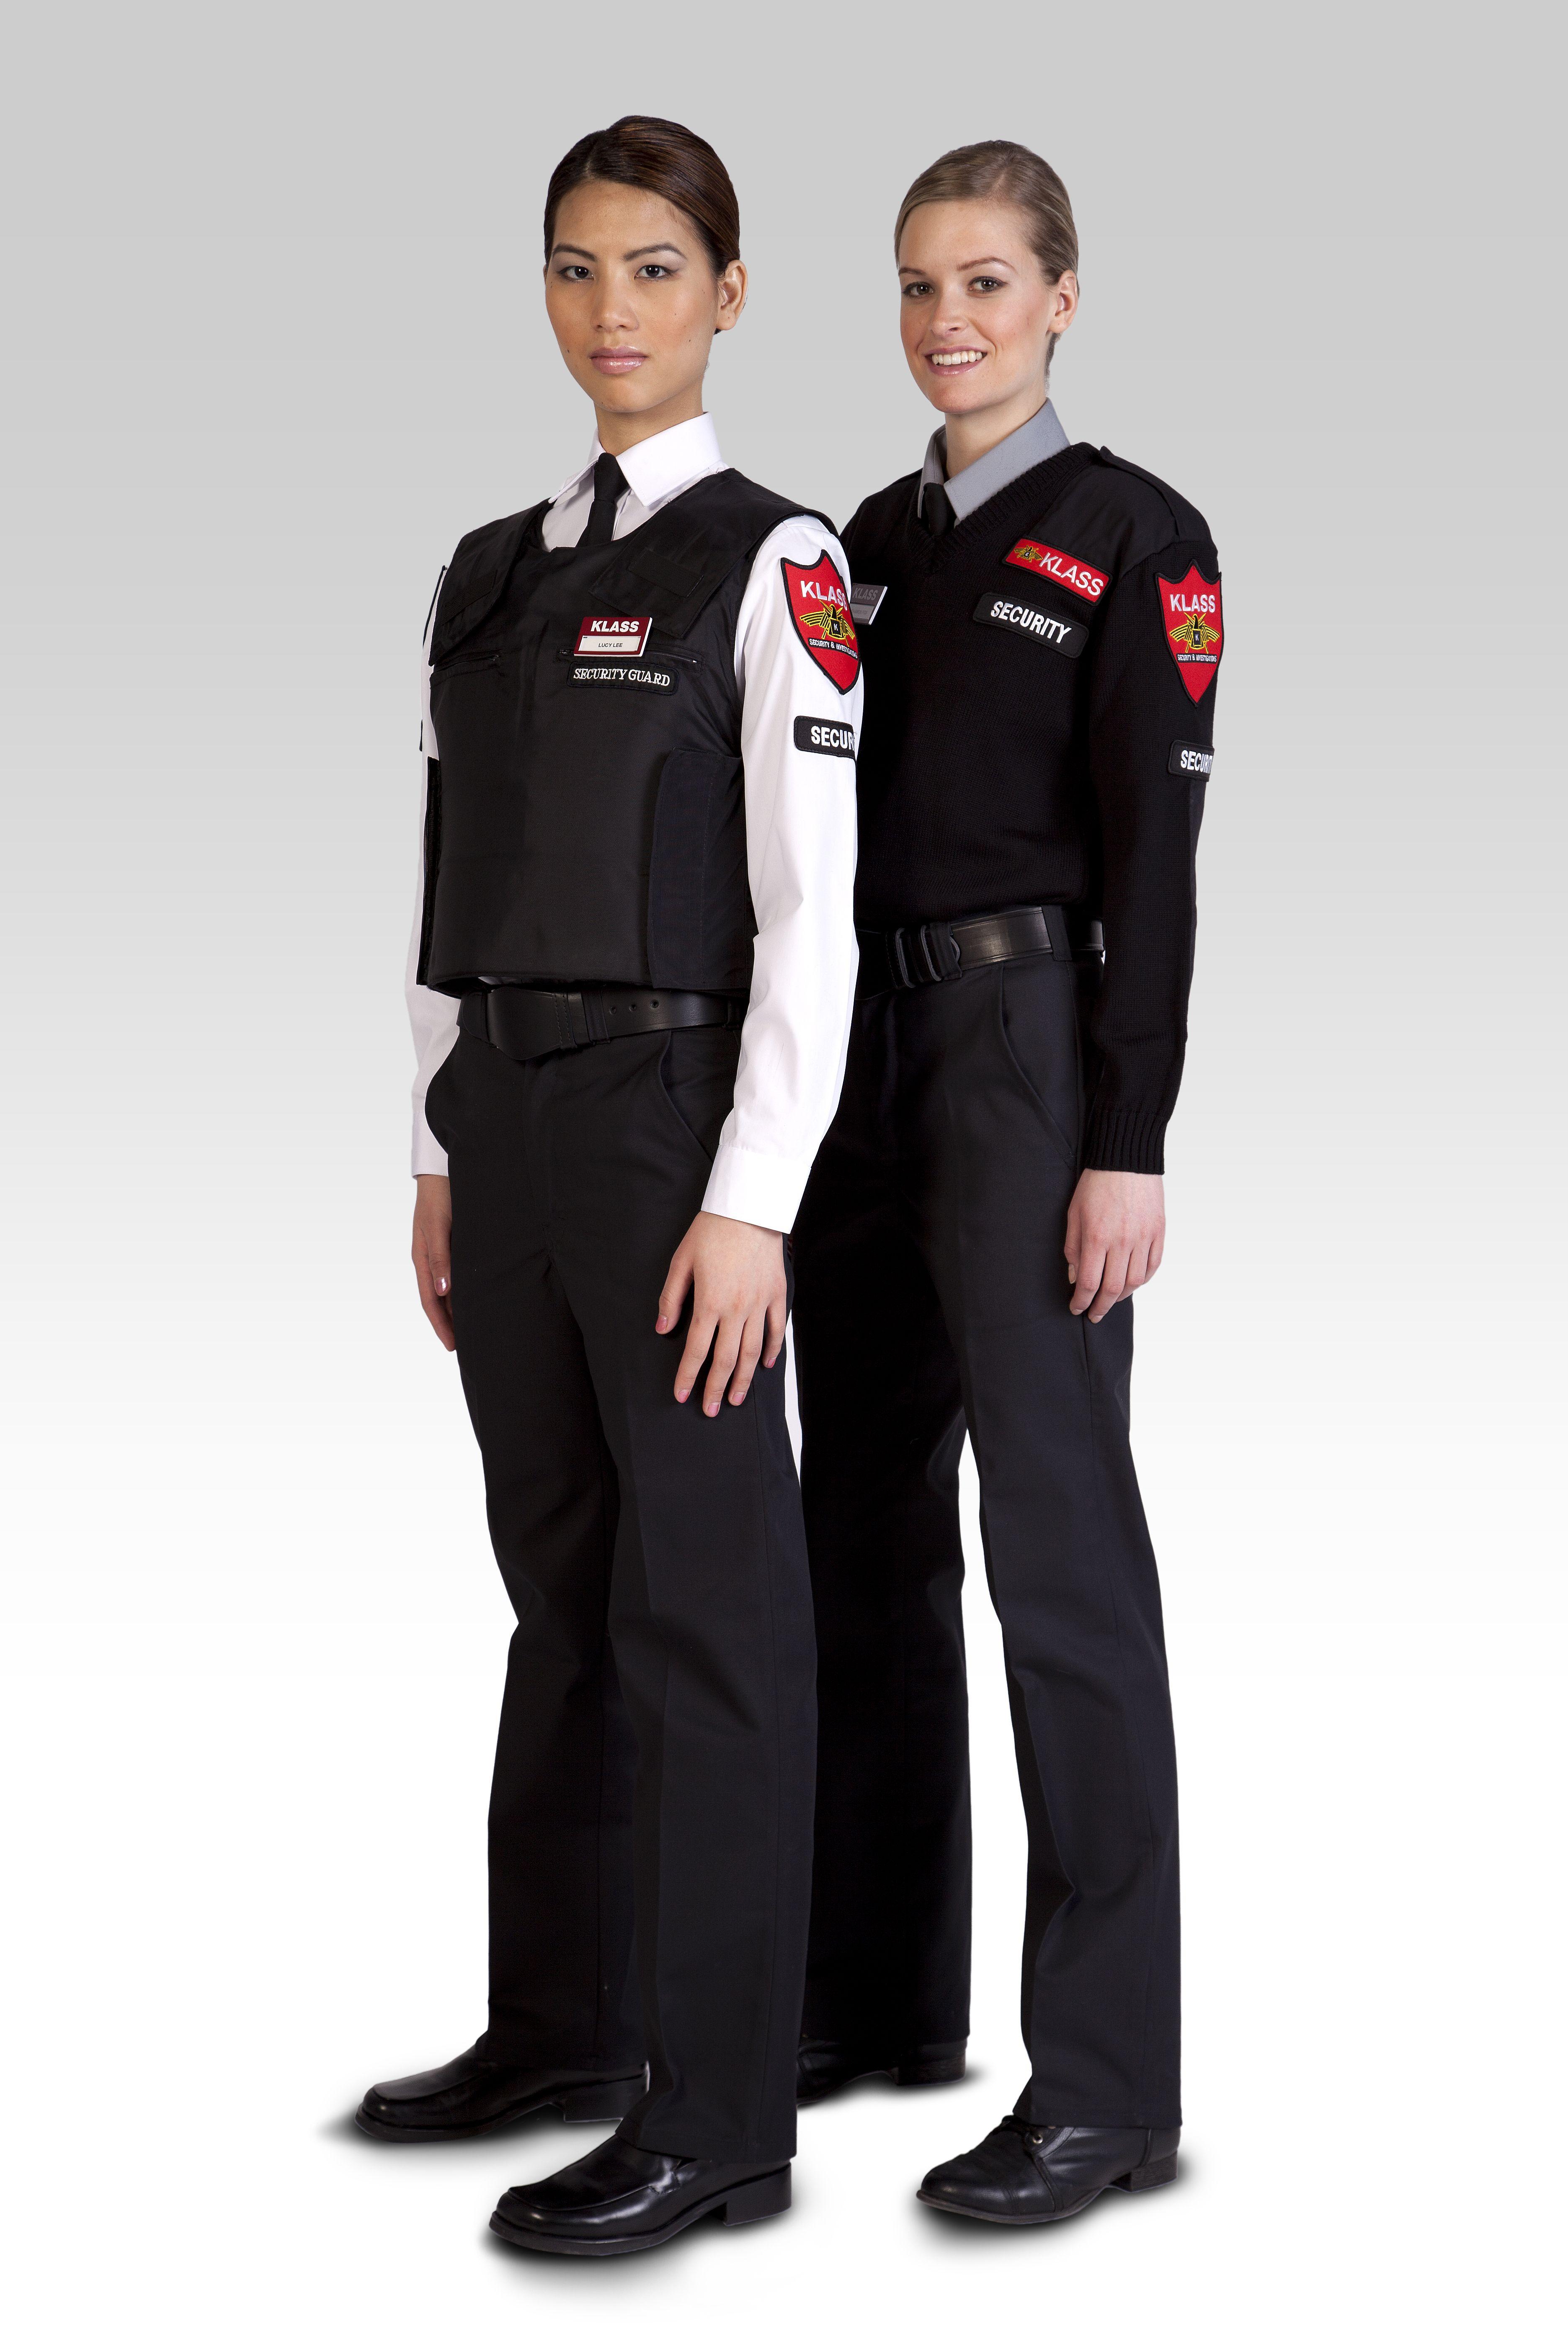 Heartland Town Centre Retail security, Security service